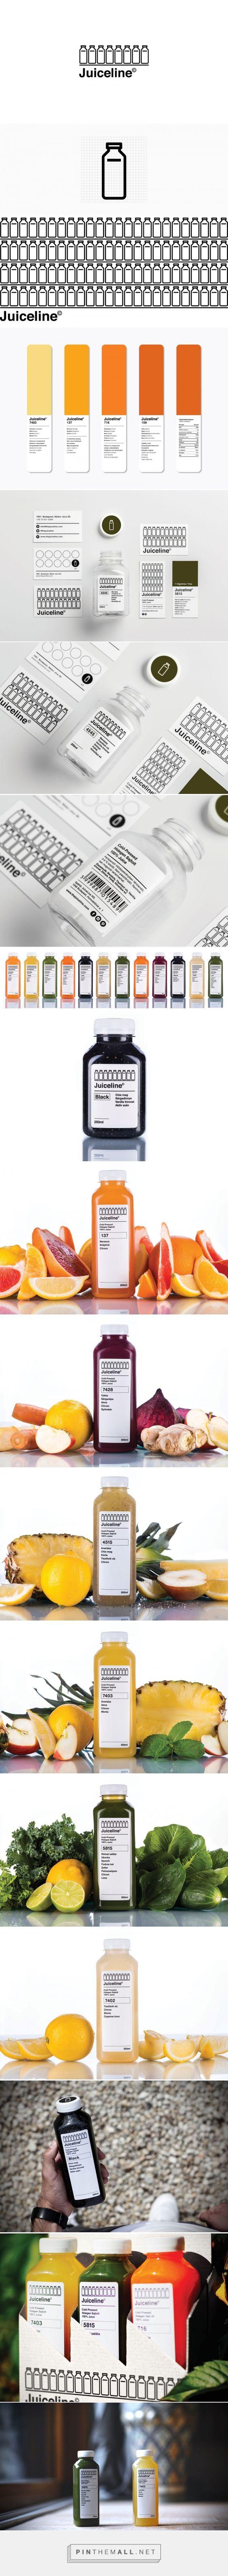 Juiceline packaging design by Kissmiklos (Hungary) - http://www.packagingoftheworld.com/2016/09/juiceline.html